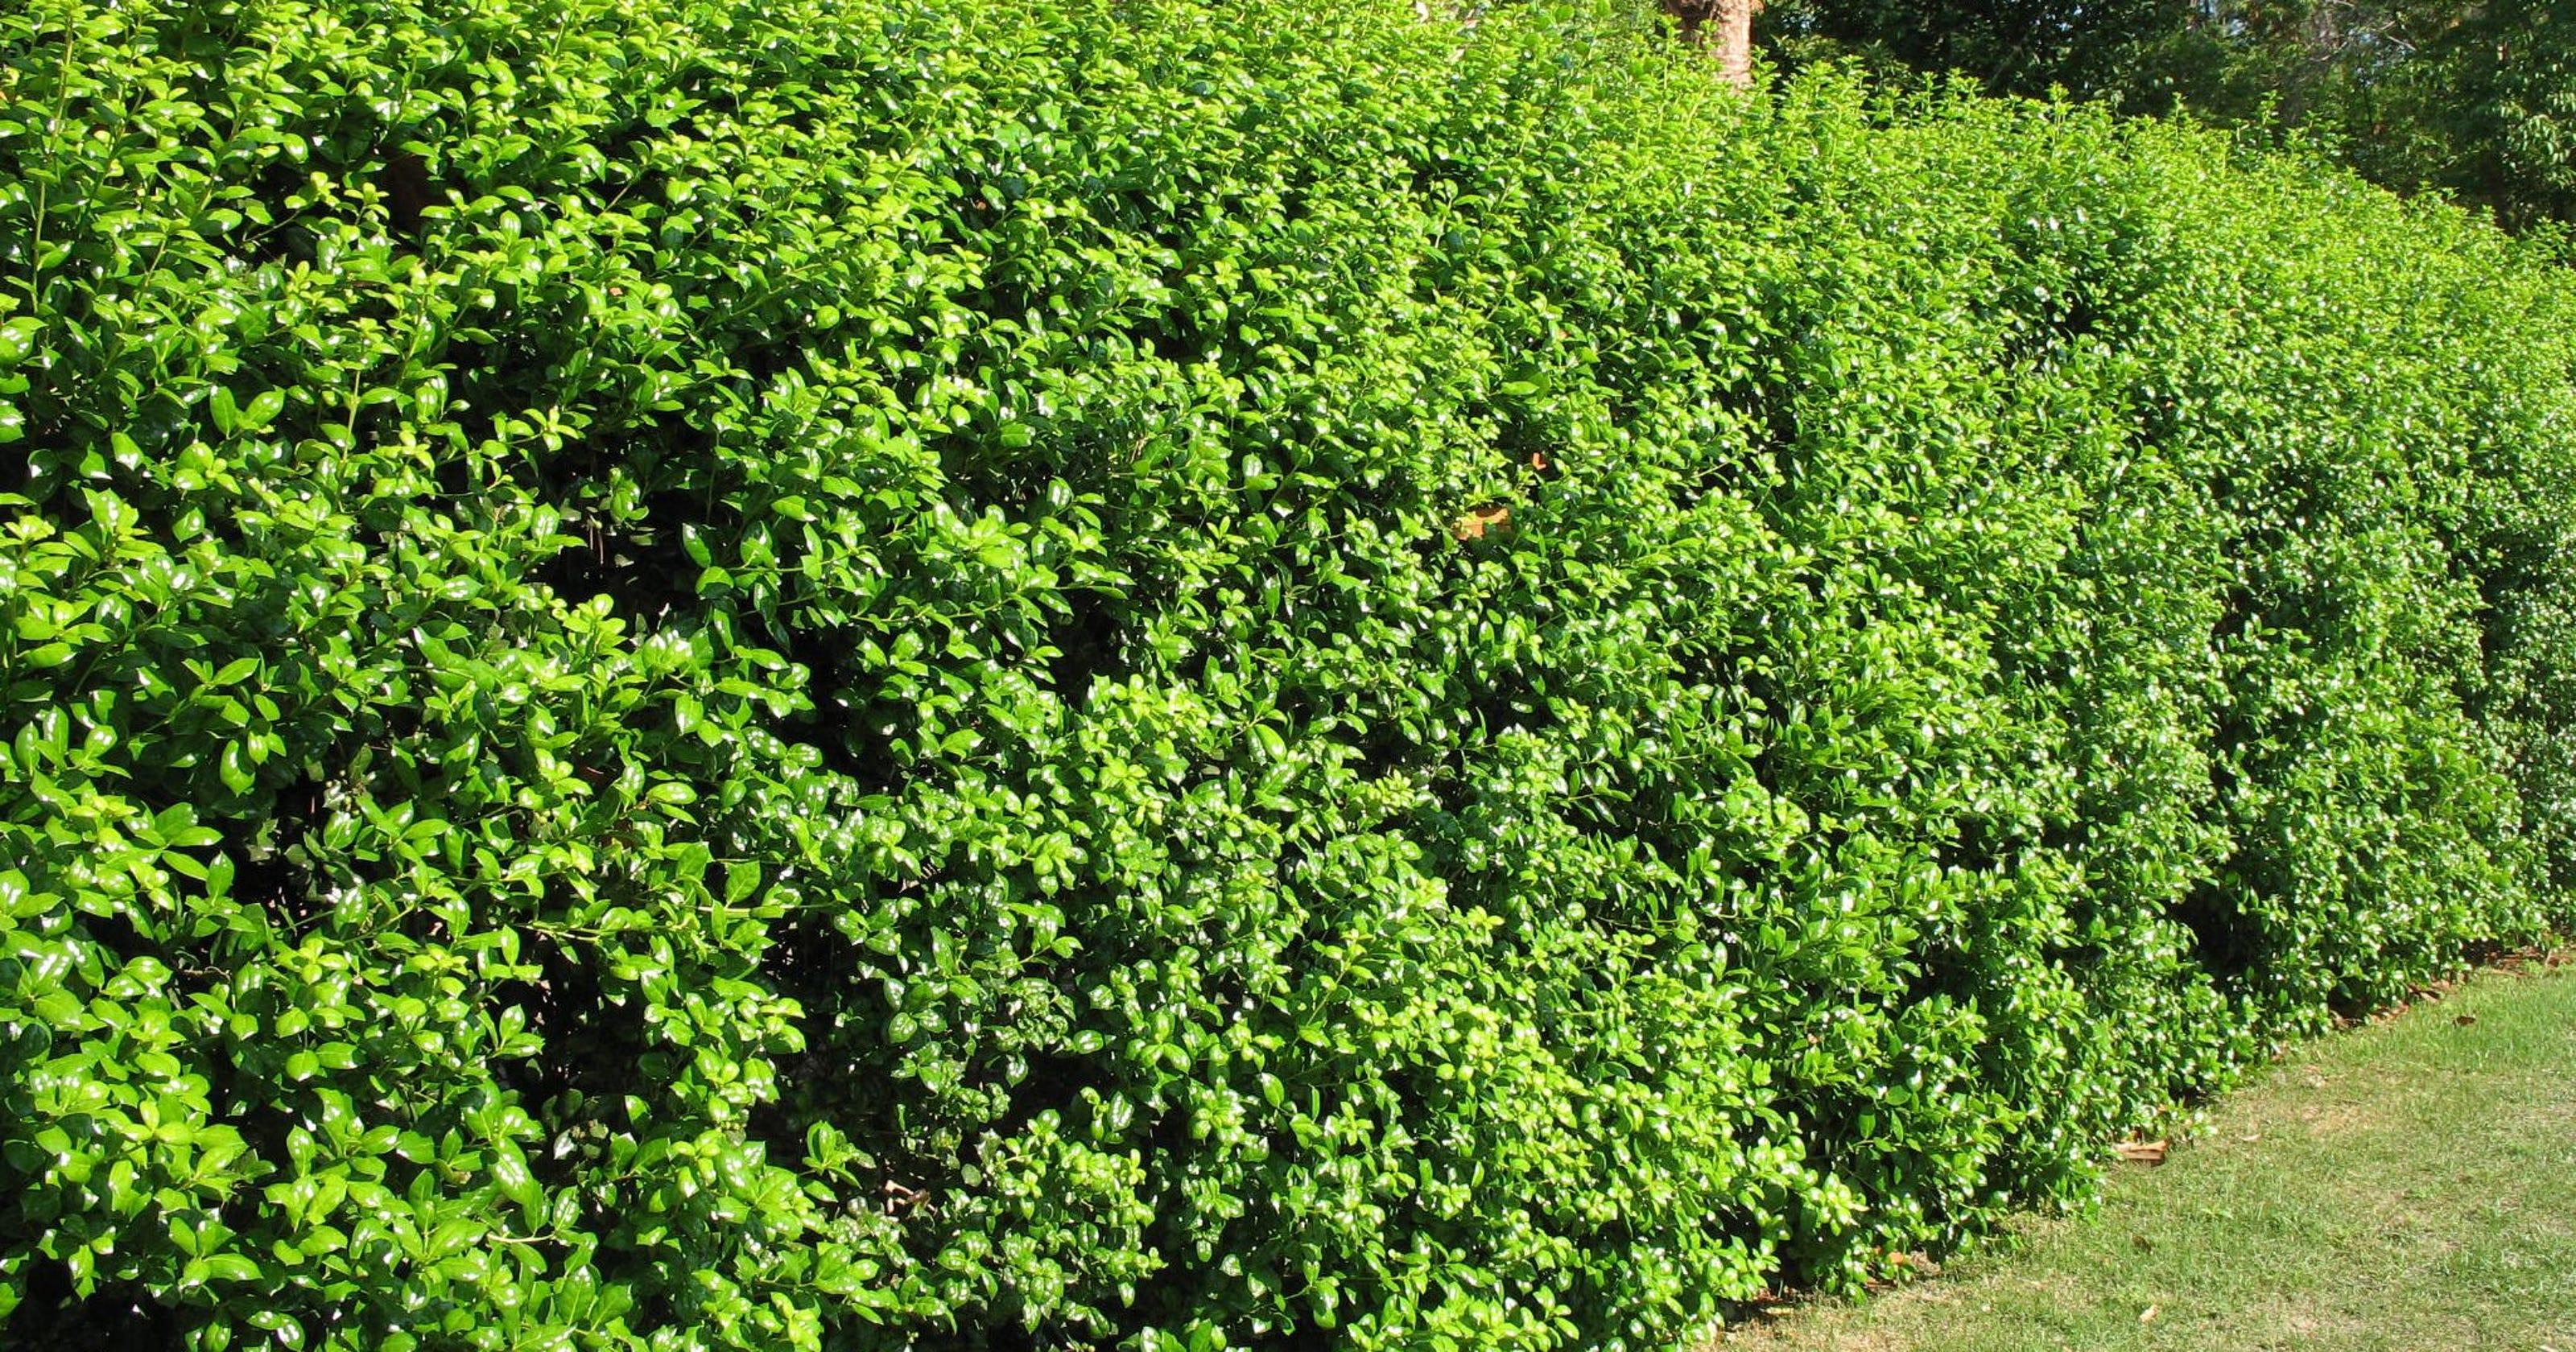 Foto Di Piante Sempreverdi una selezione di piante per le vostre siepi